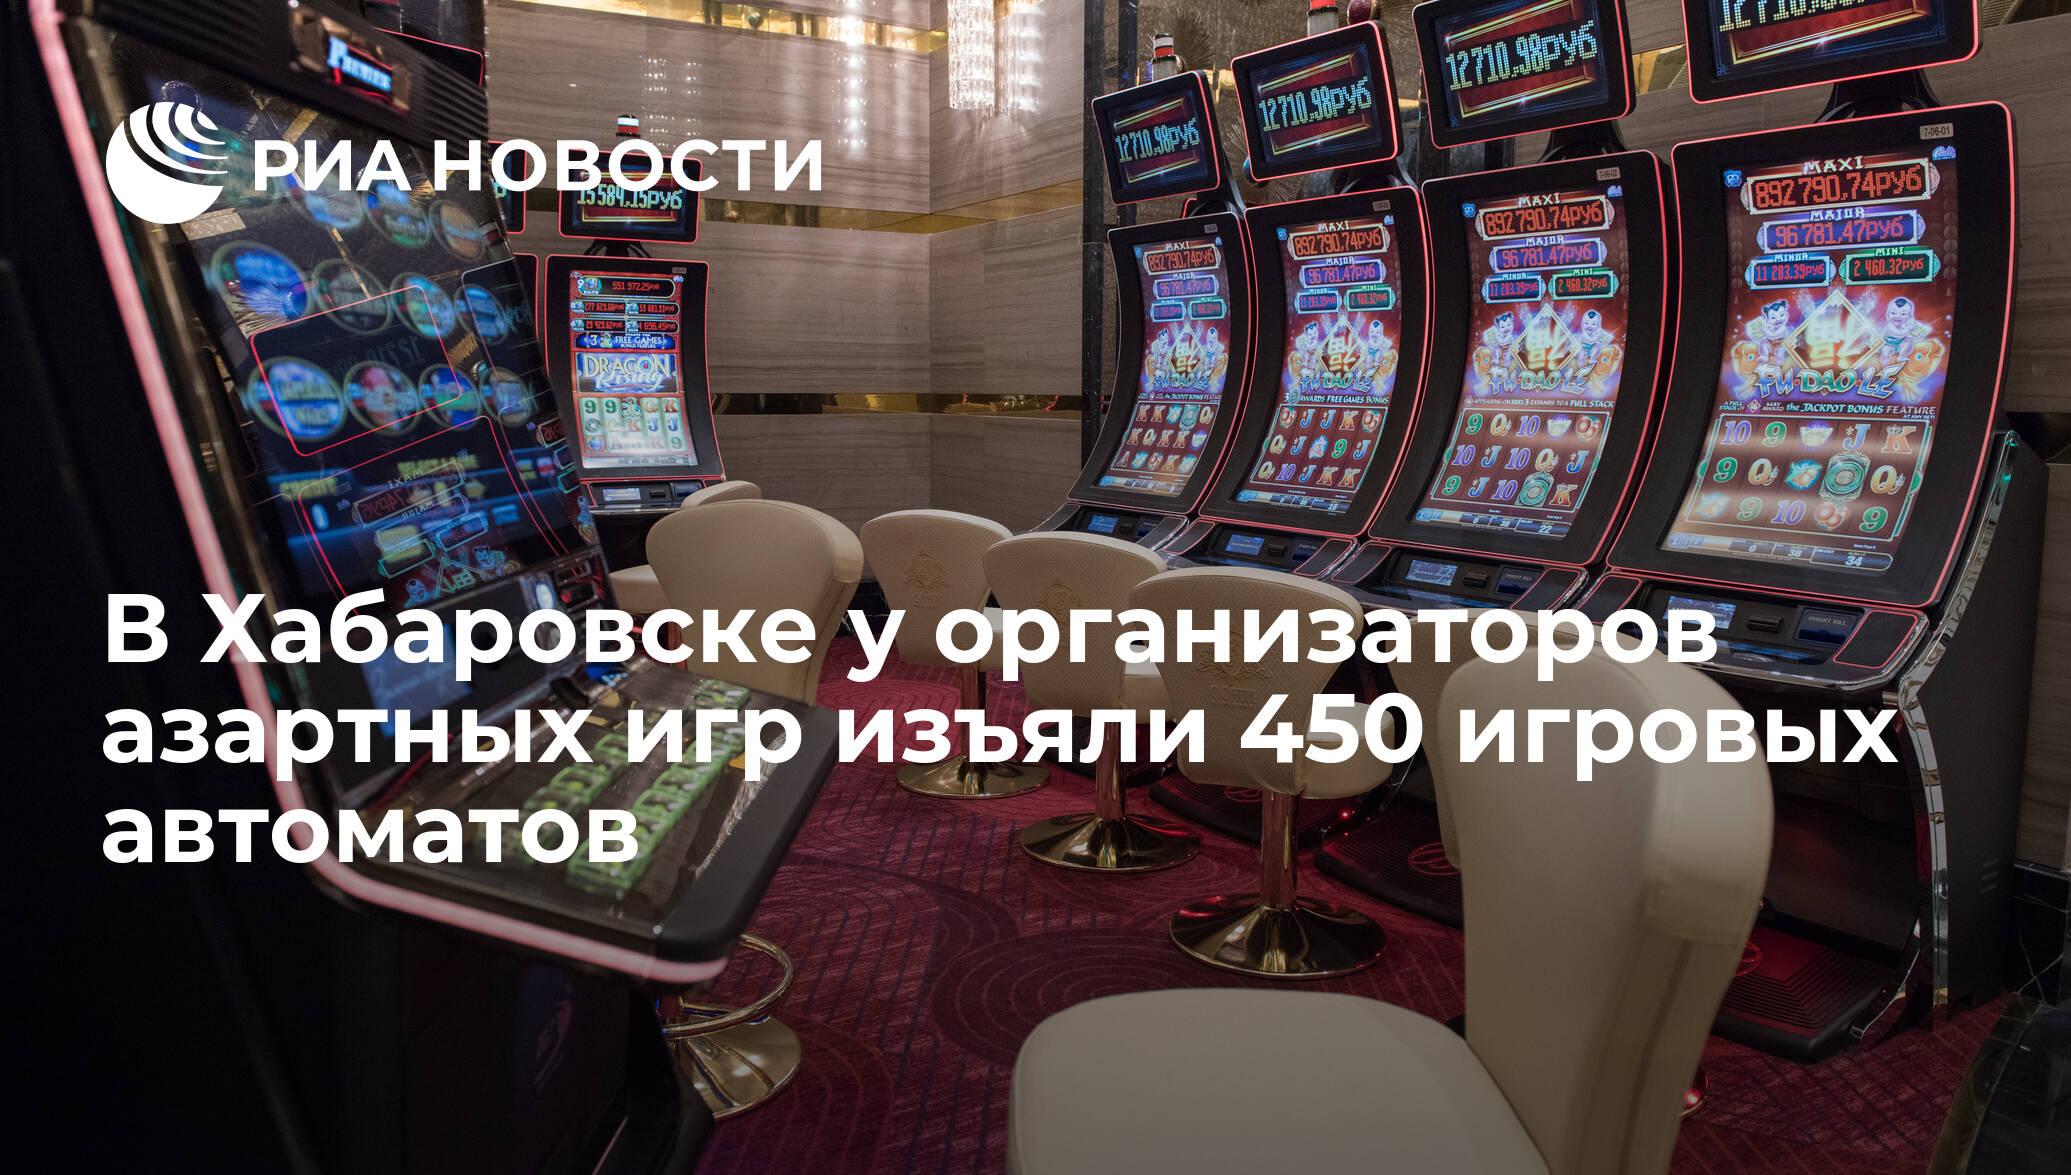 The true sheriff игровой автомат